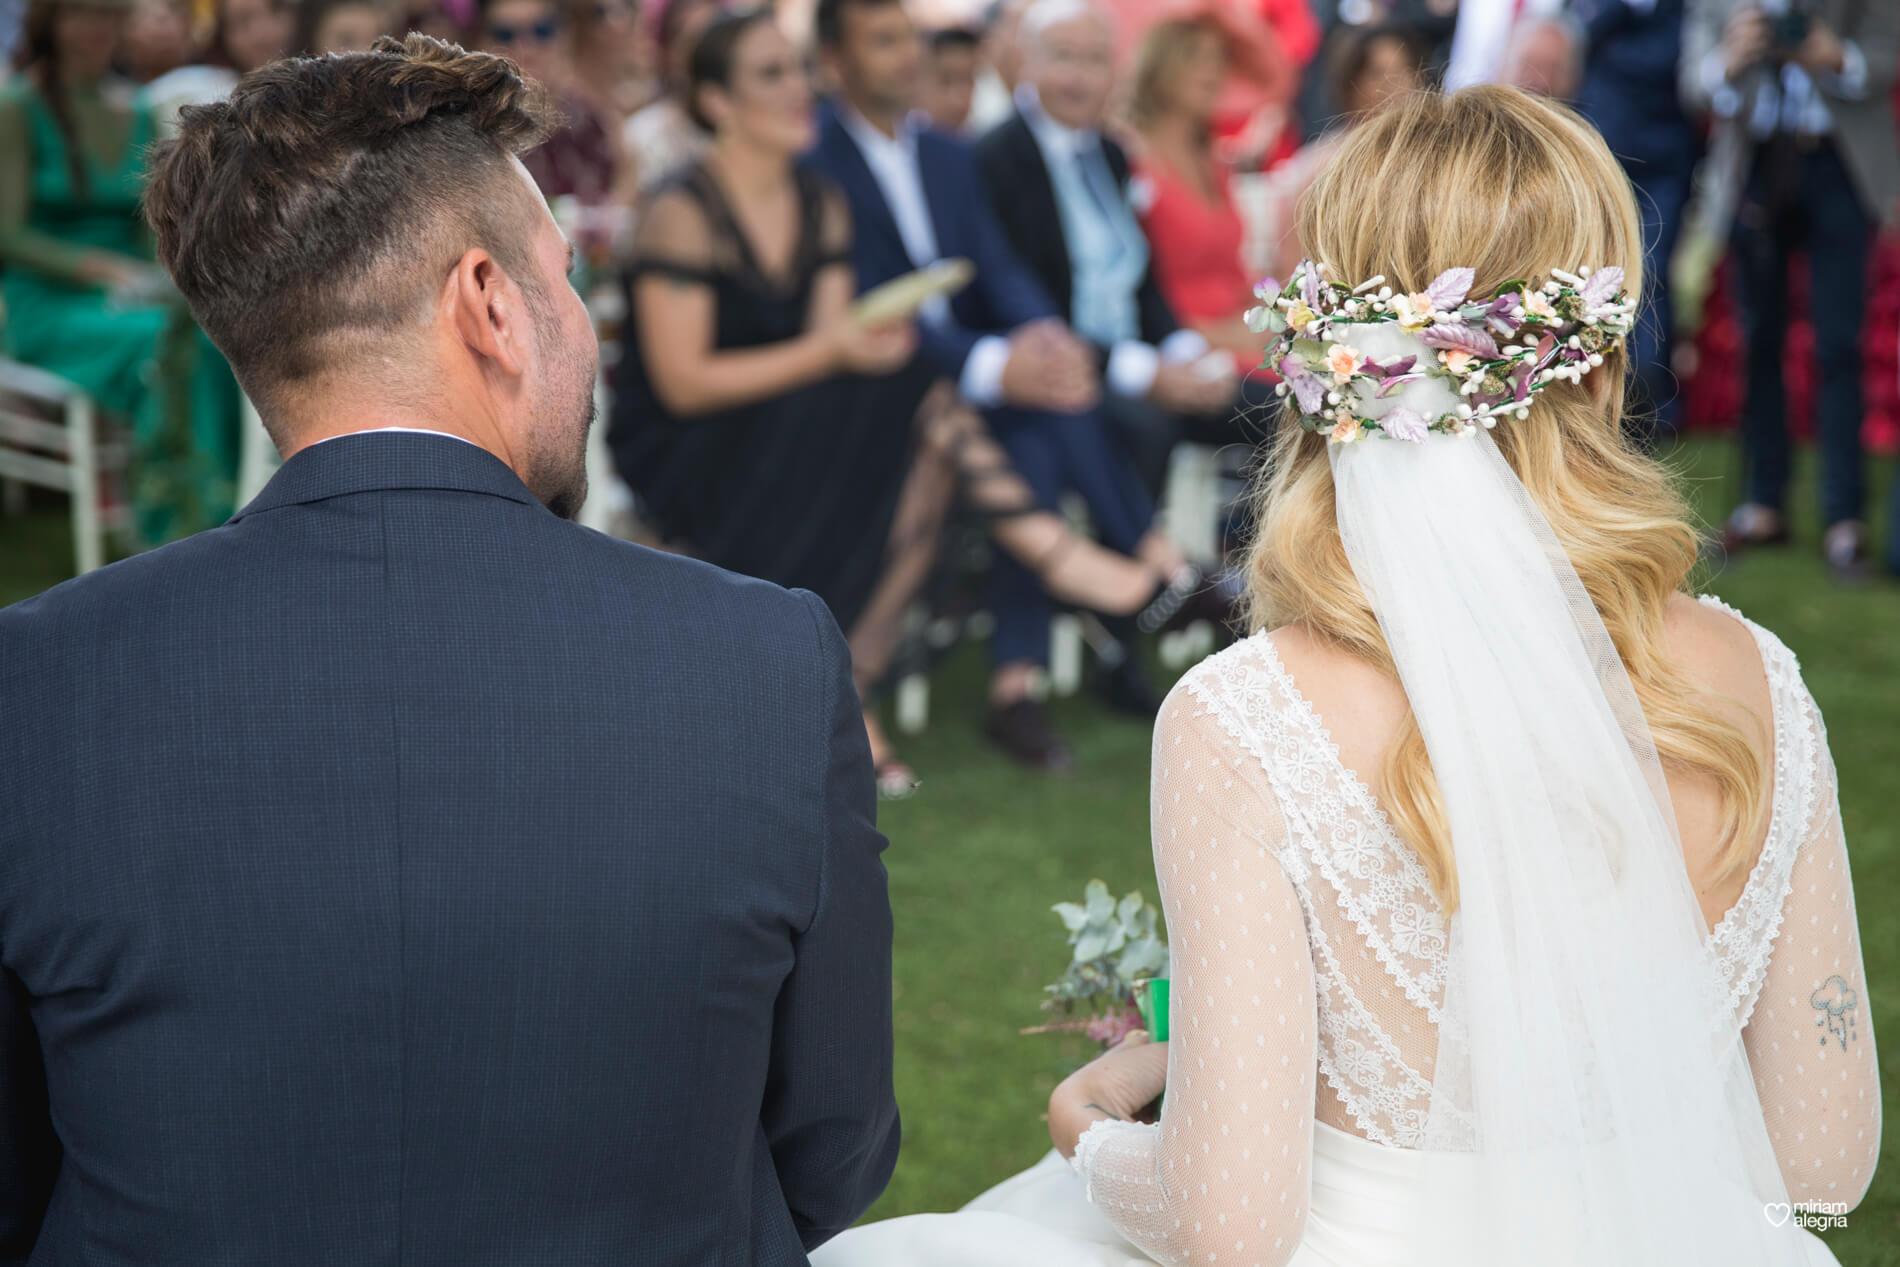 la-boda-de-alemc7-miriam-alegria-fotografos-boda-murcia-51